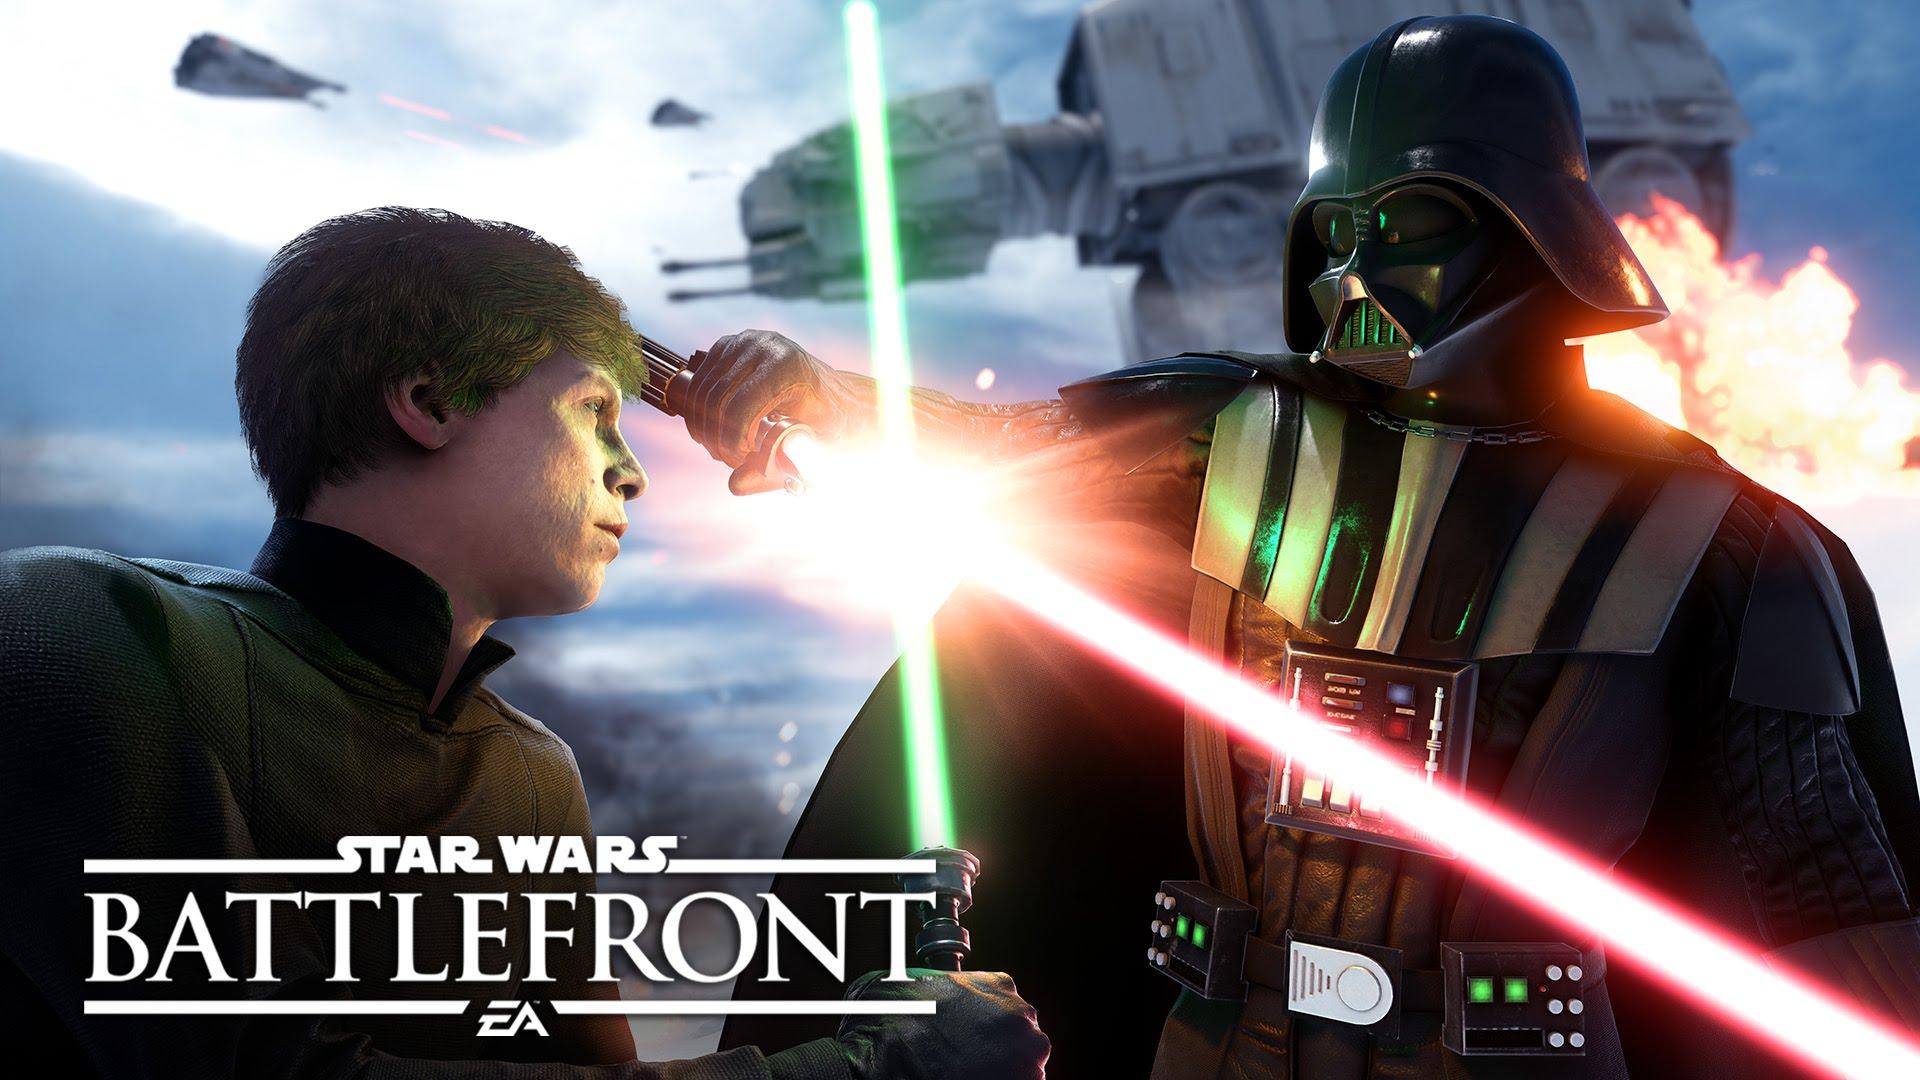 『Star Wars バトルフロント』、1300万本の出荷を達成